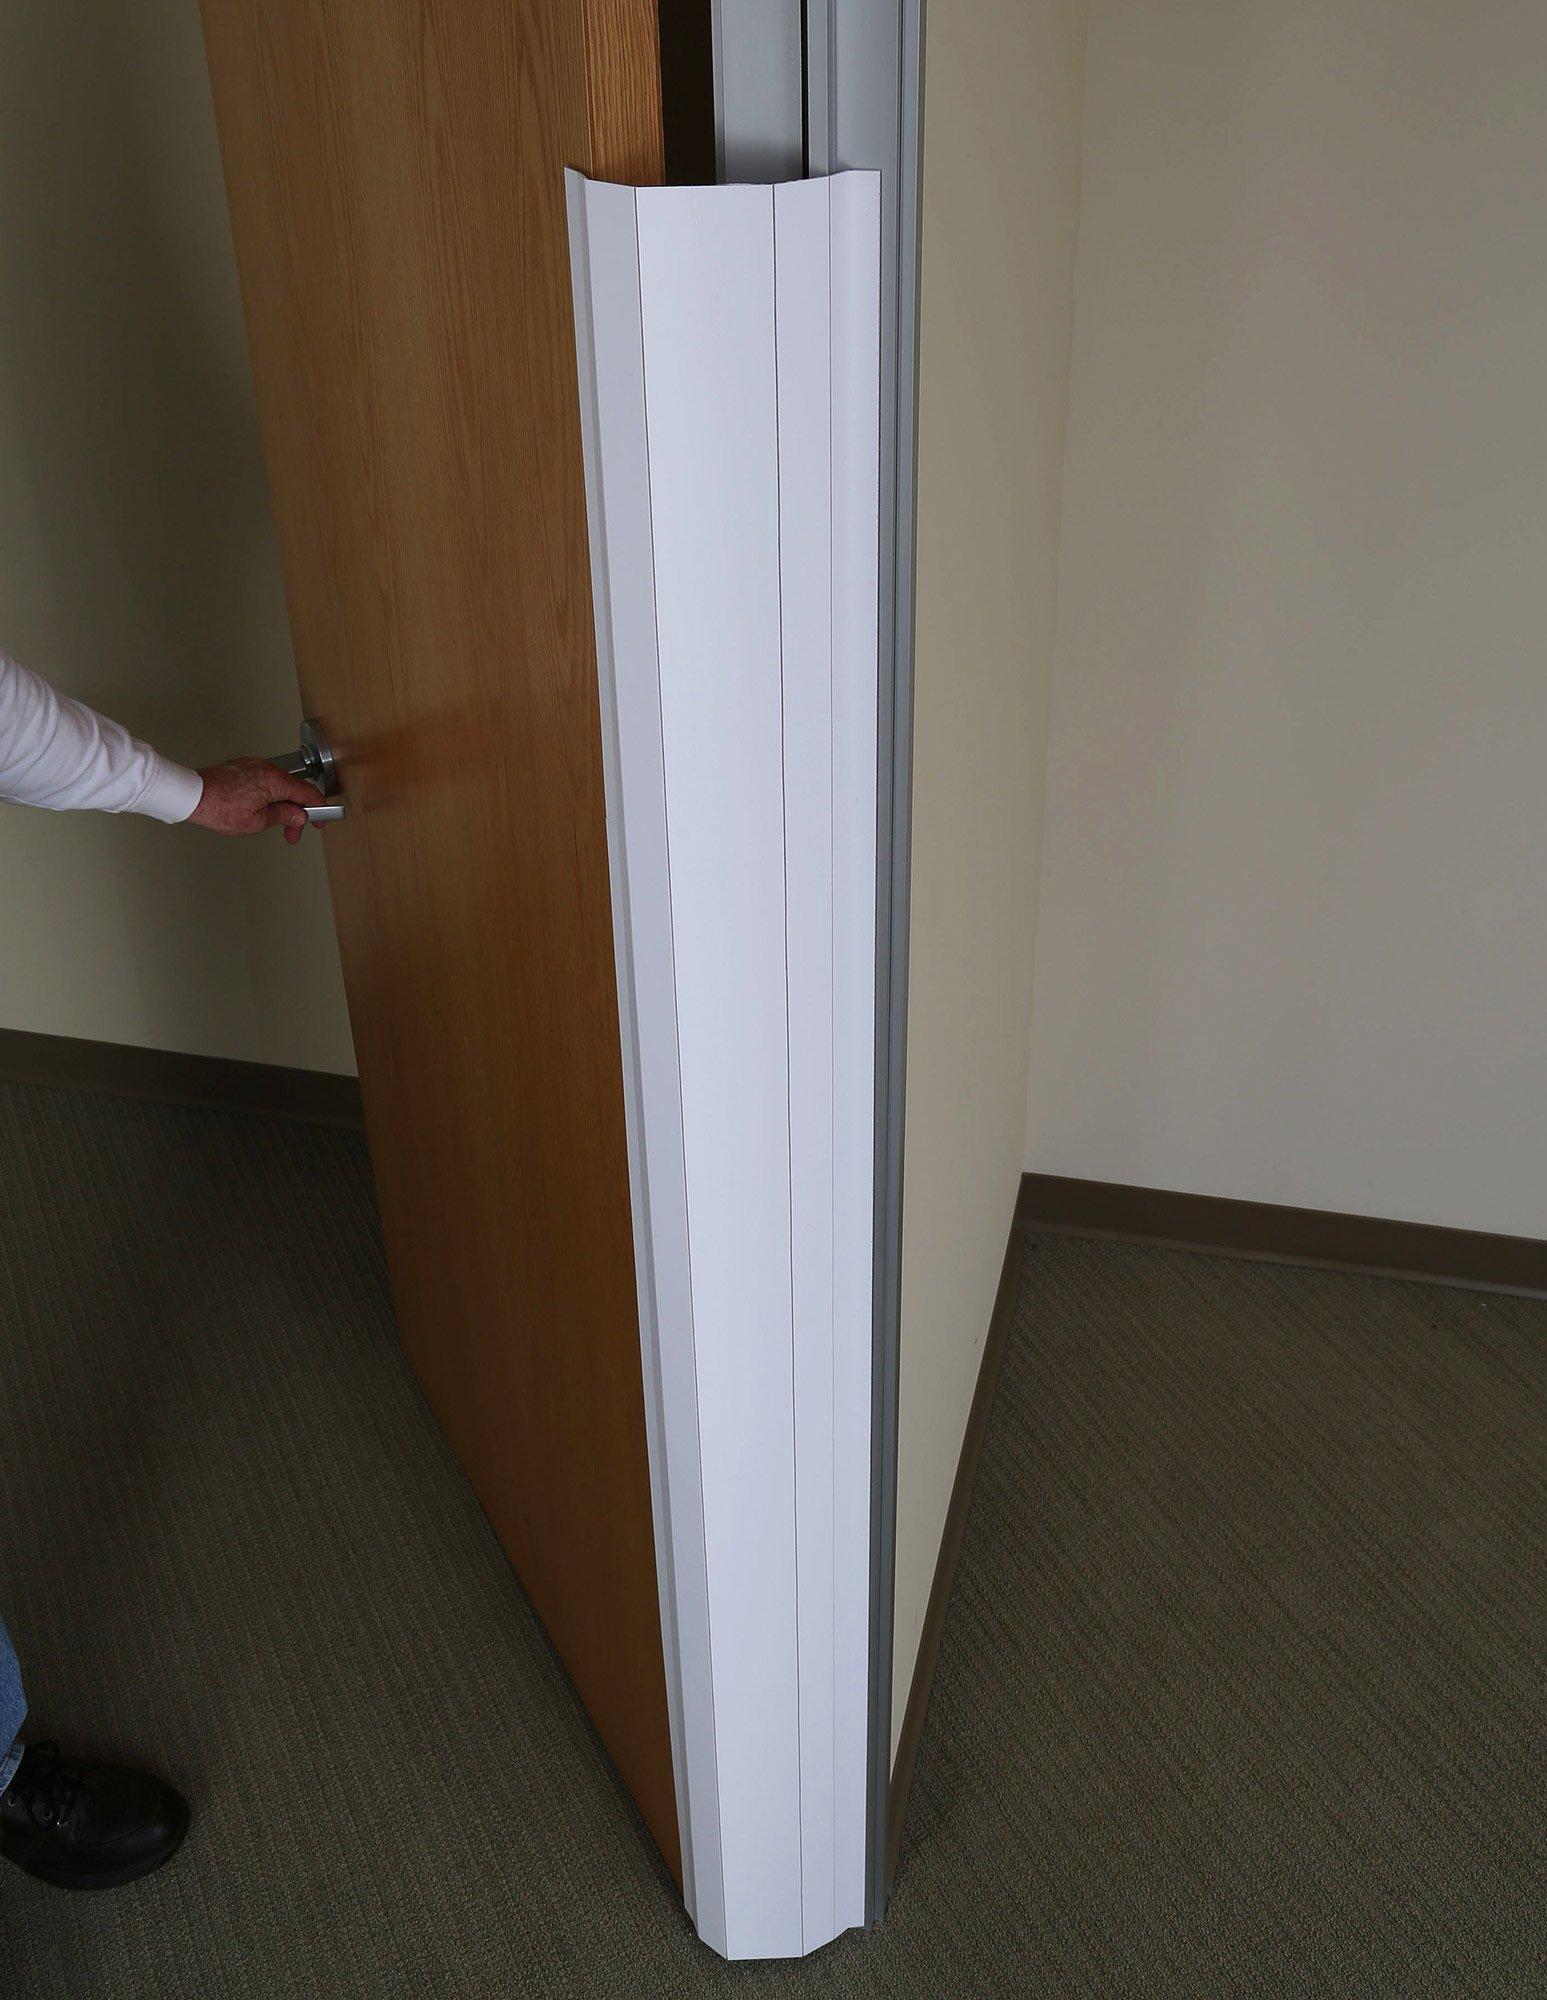 PinchNot Commercial Set Door Finger Hinge-Side Safety Guard Shield Protector